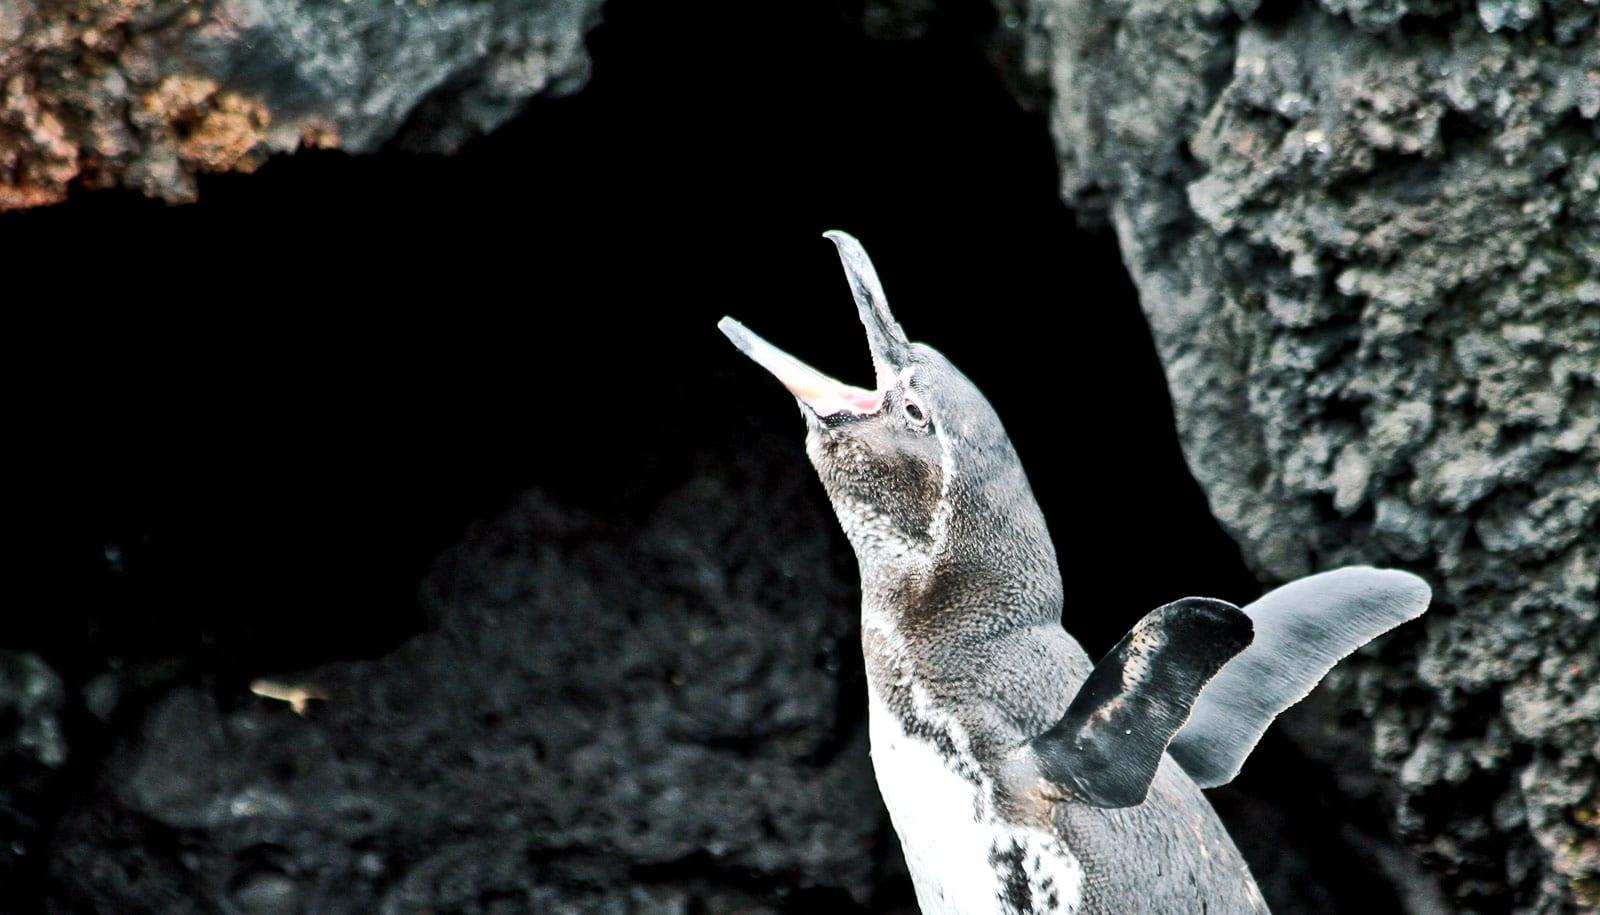 Some penguins mooch off parents after leaving the nest